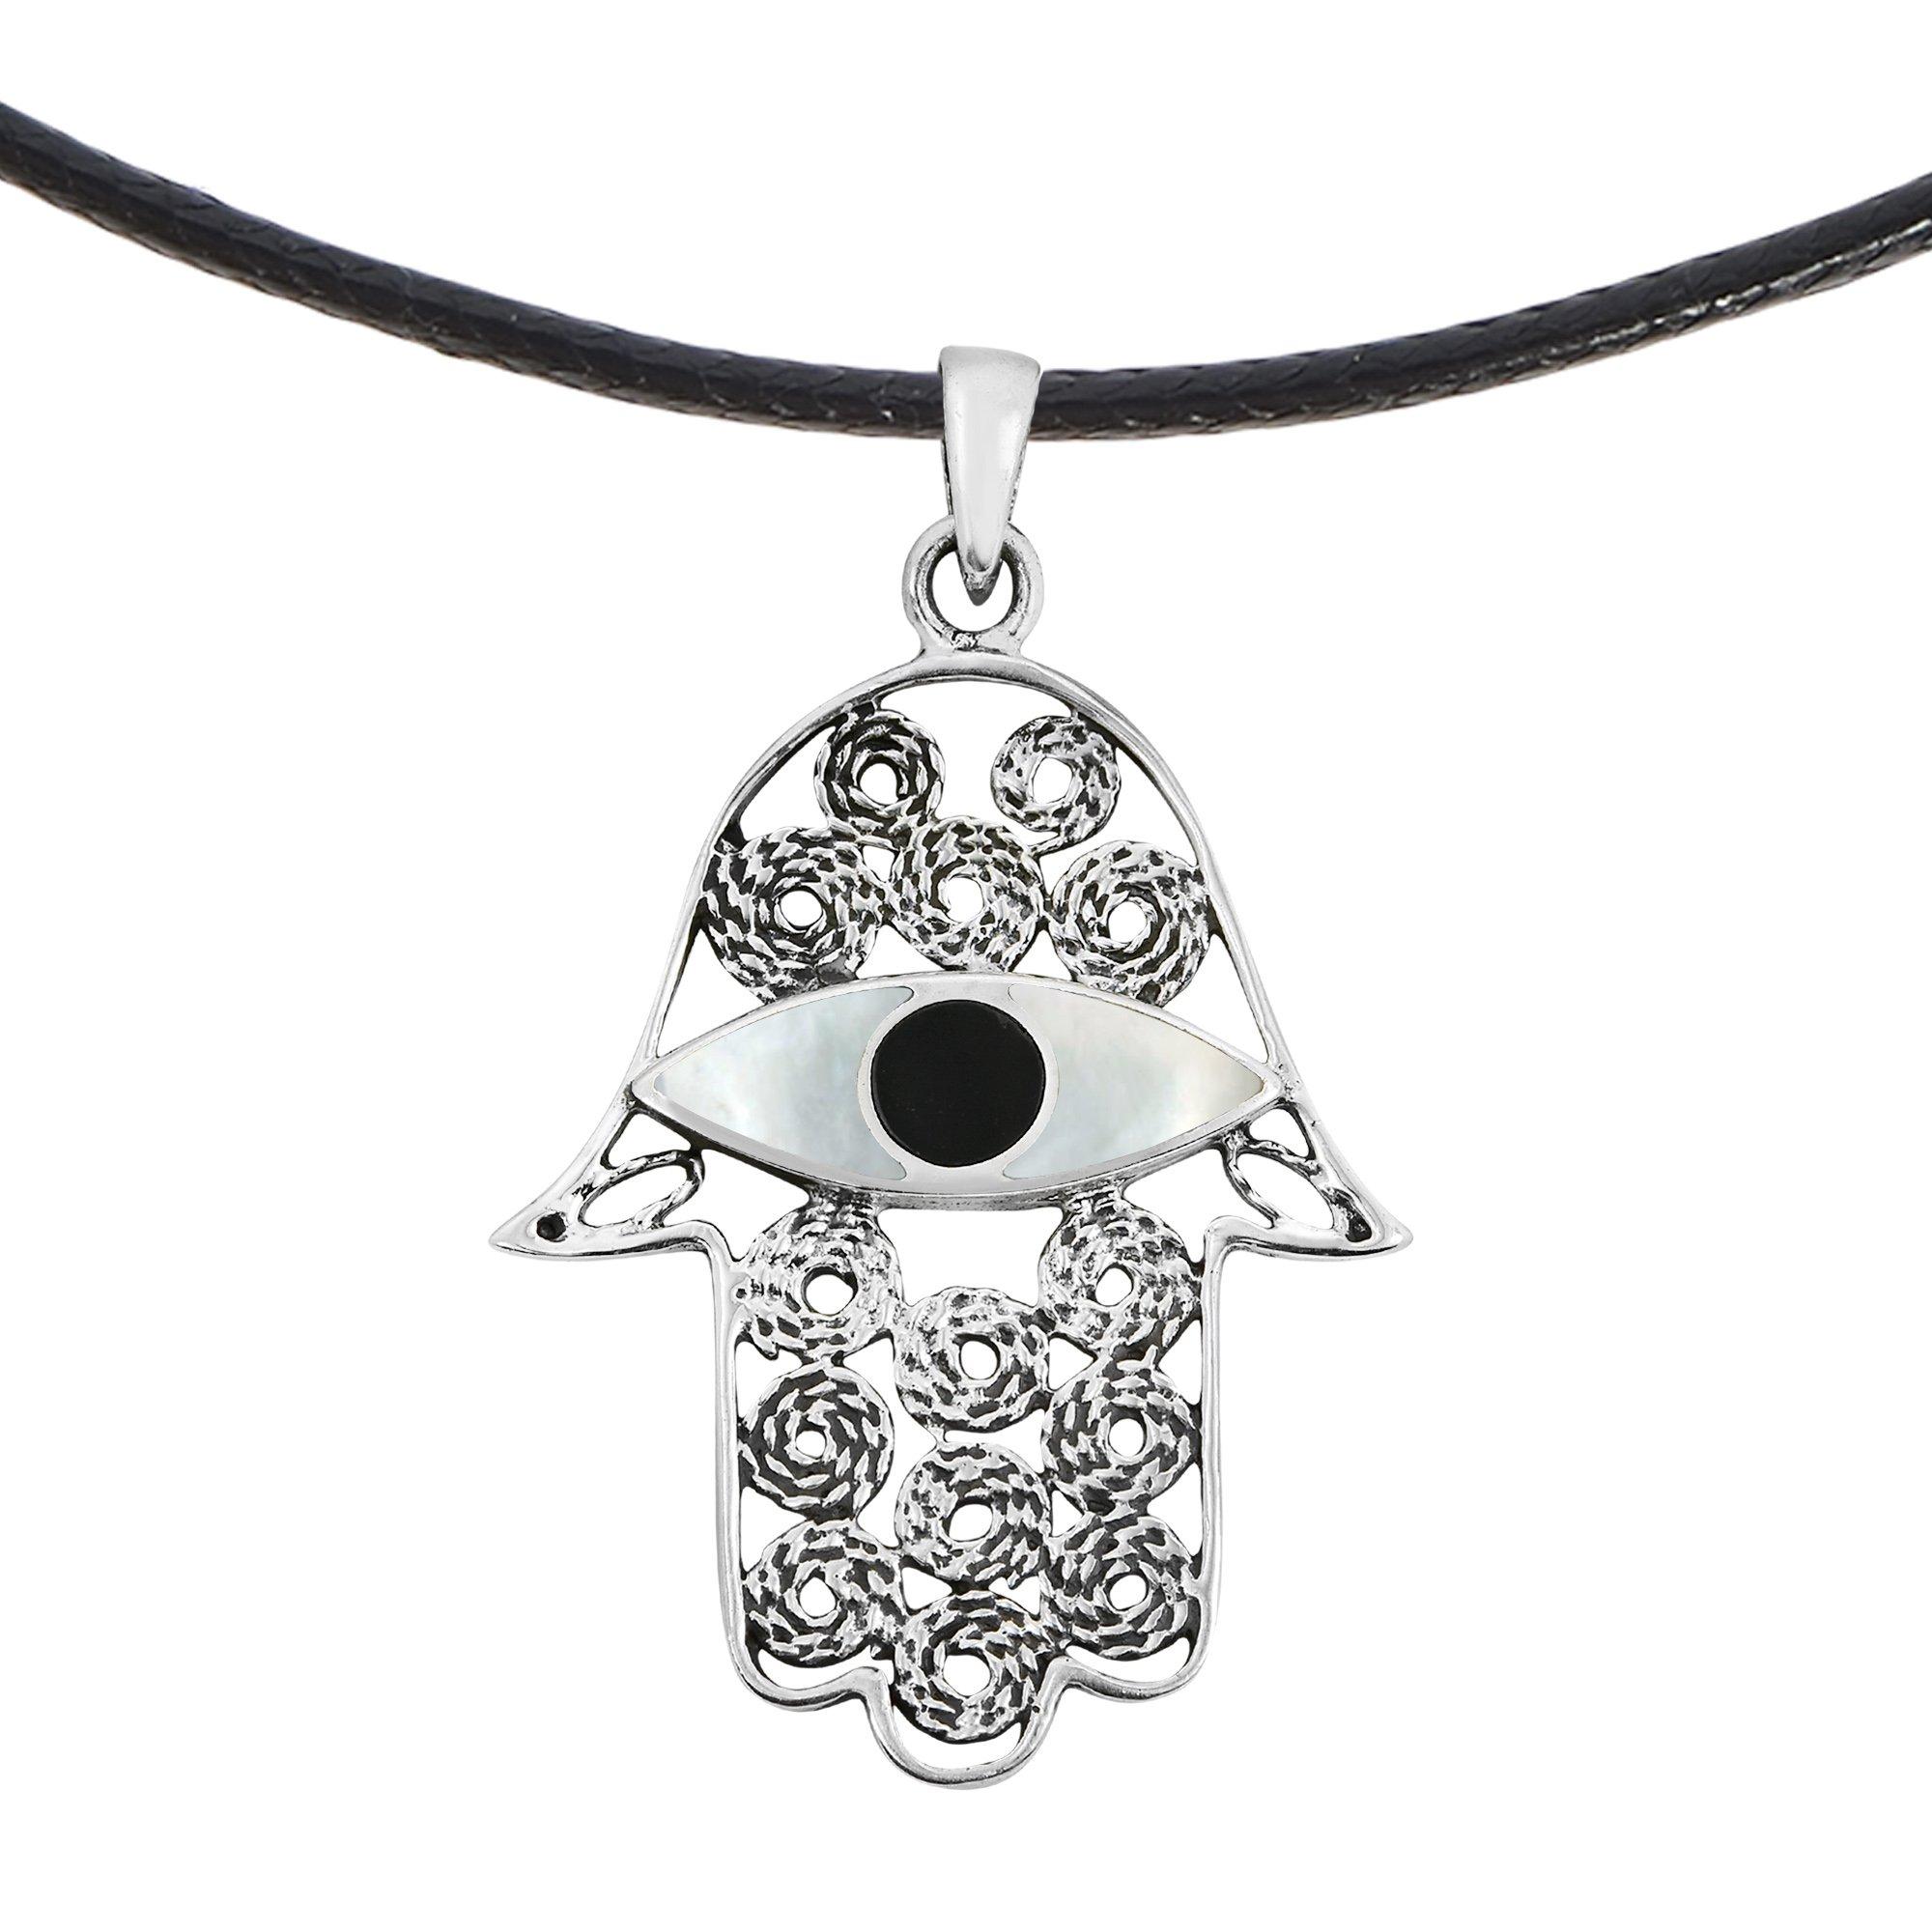 AeraVida Lucky Hamsa Hand of Fatima Amulet Evil Eye Stone Inlay Cotton Wax Cord Necklace